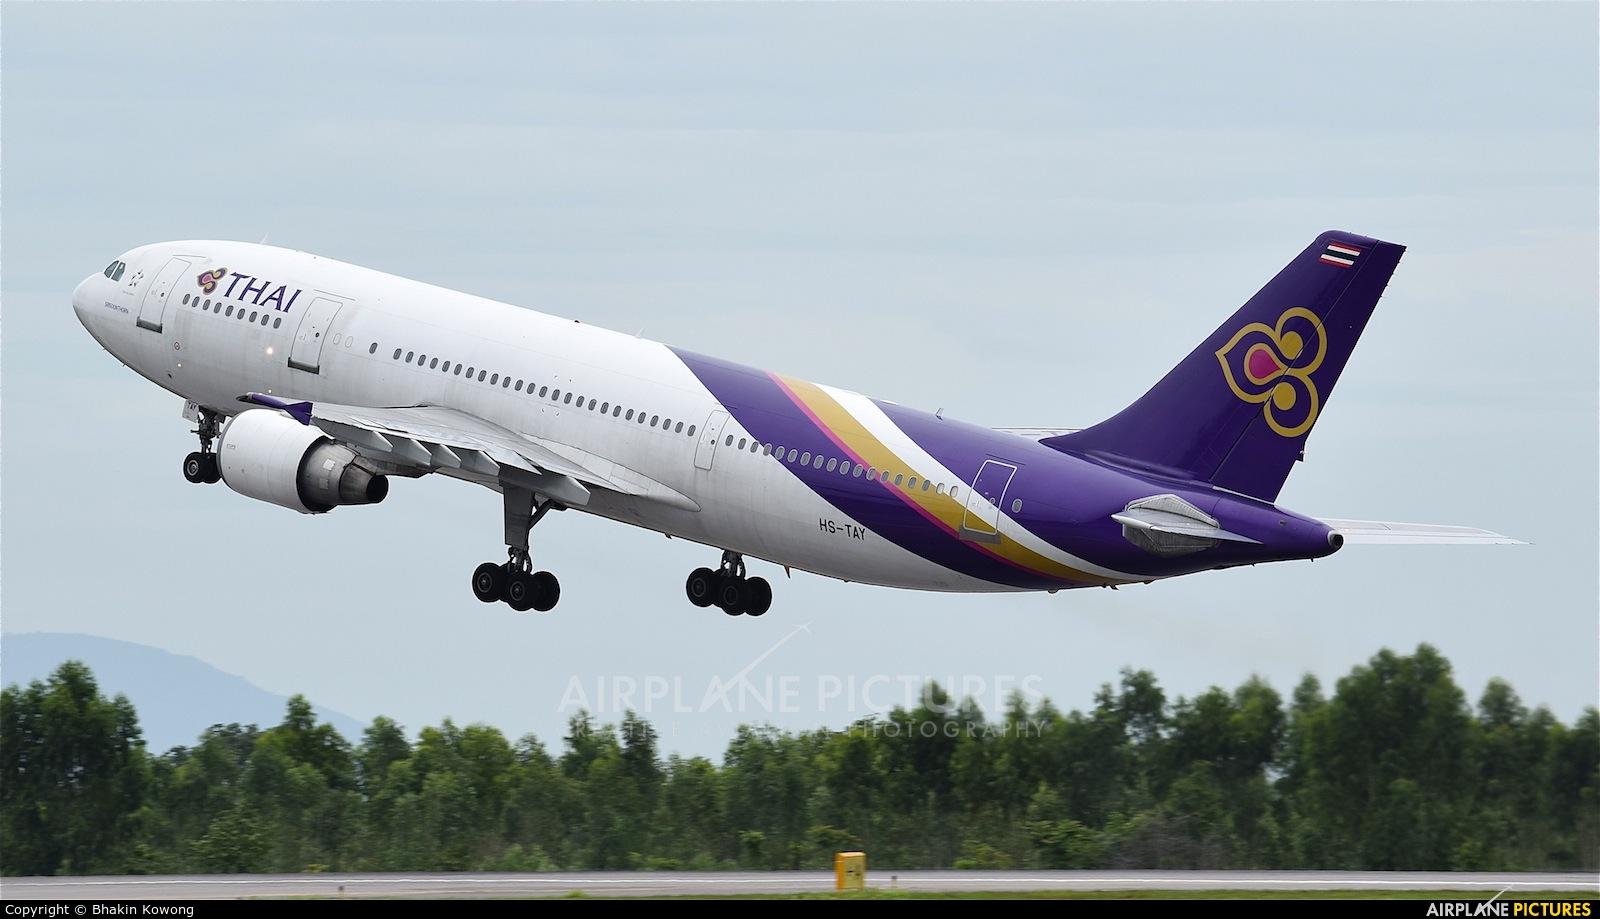 Thai Airways HS-TAY aircraft at Khon Kaen